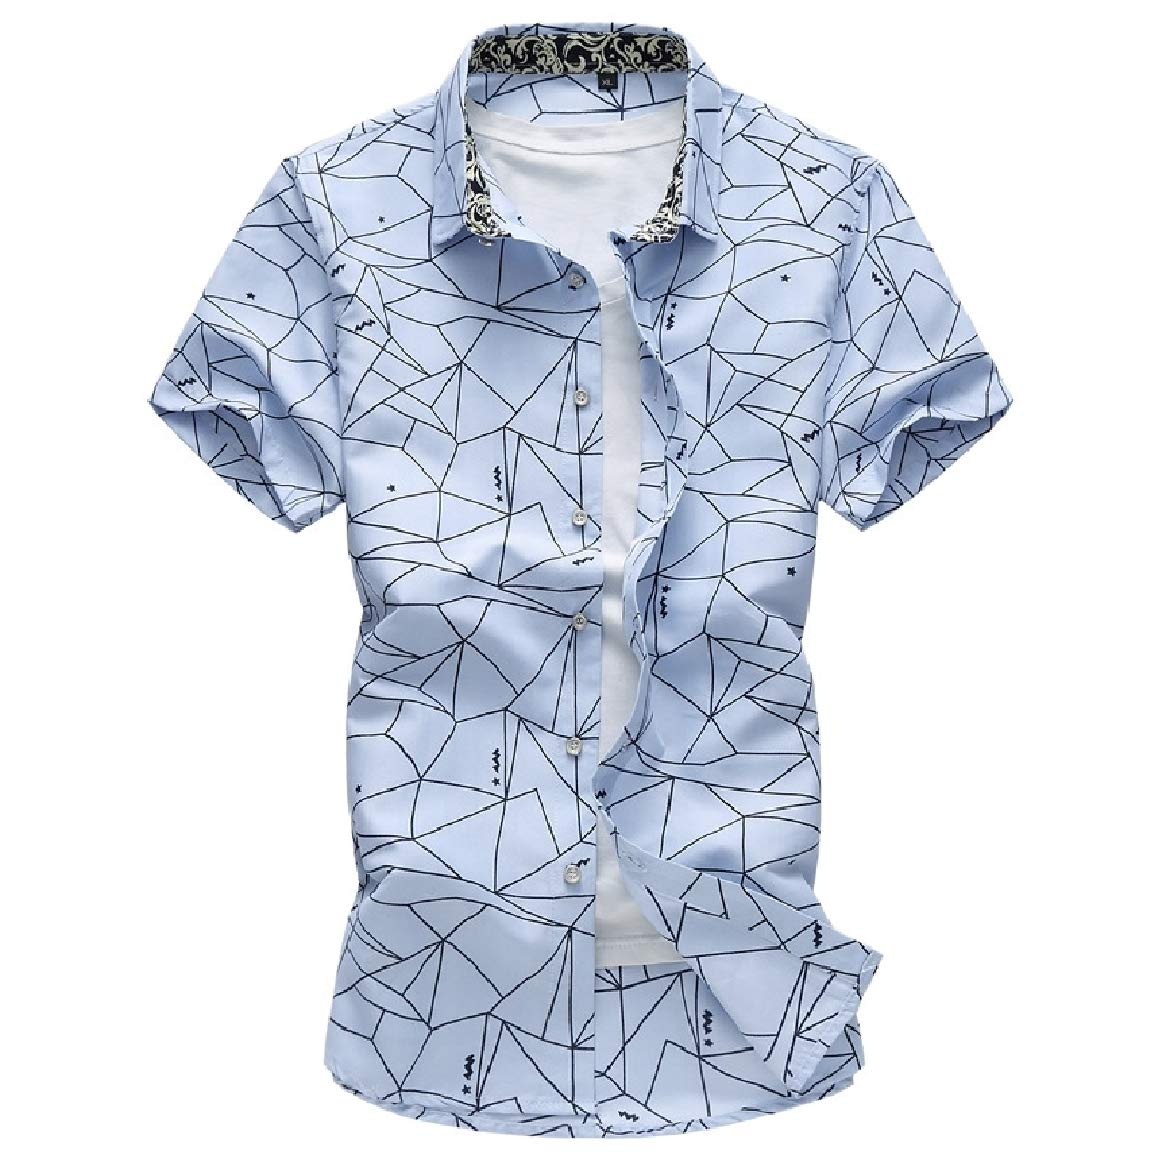 QUHS Mens Short-Sleeve Print Leisure Plus-Size Fashion Button Down Dress Shirt